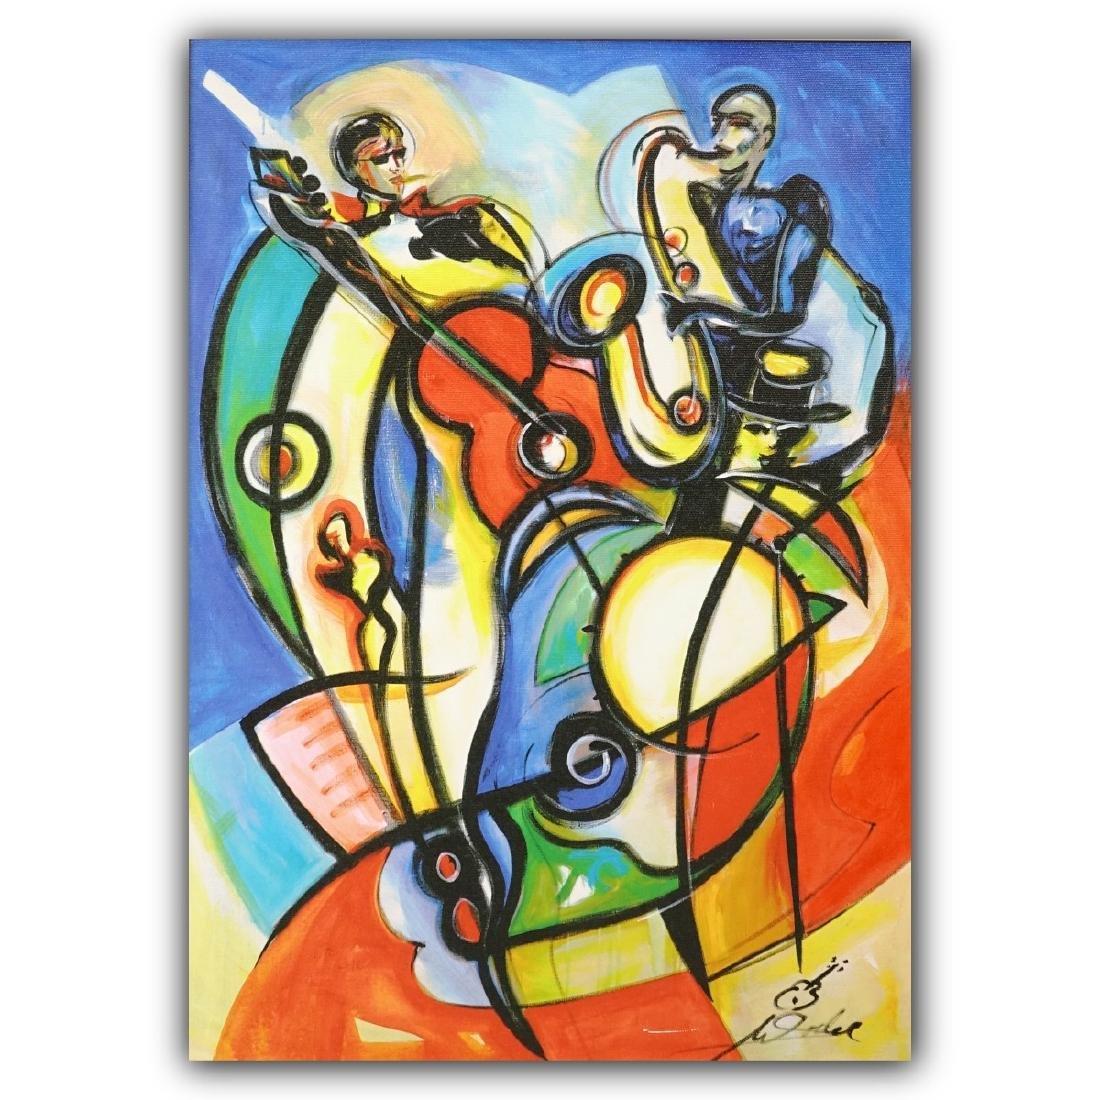 Alfred Gockel (b. 1958) Giclee on Canvas